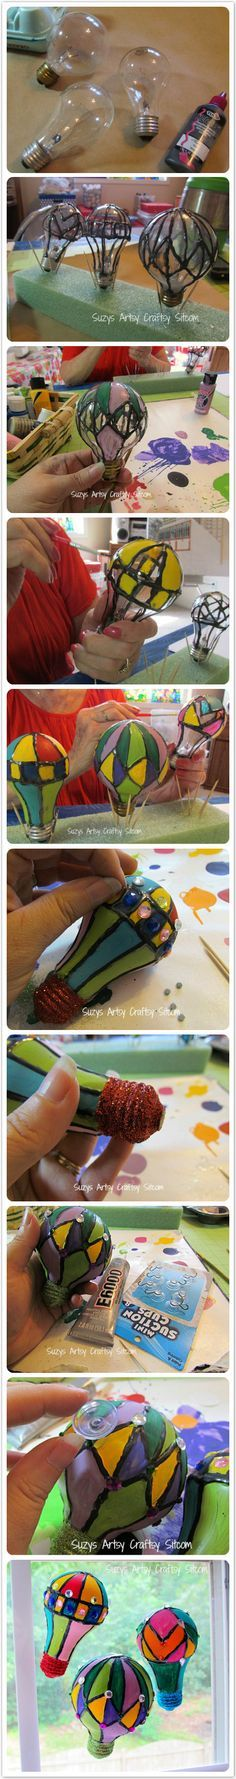 Make Hot Air Balloon Suncatchers from old lightbulbs